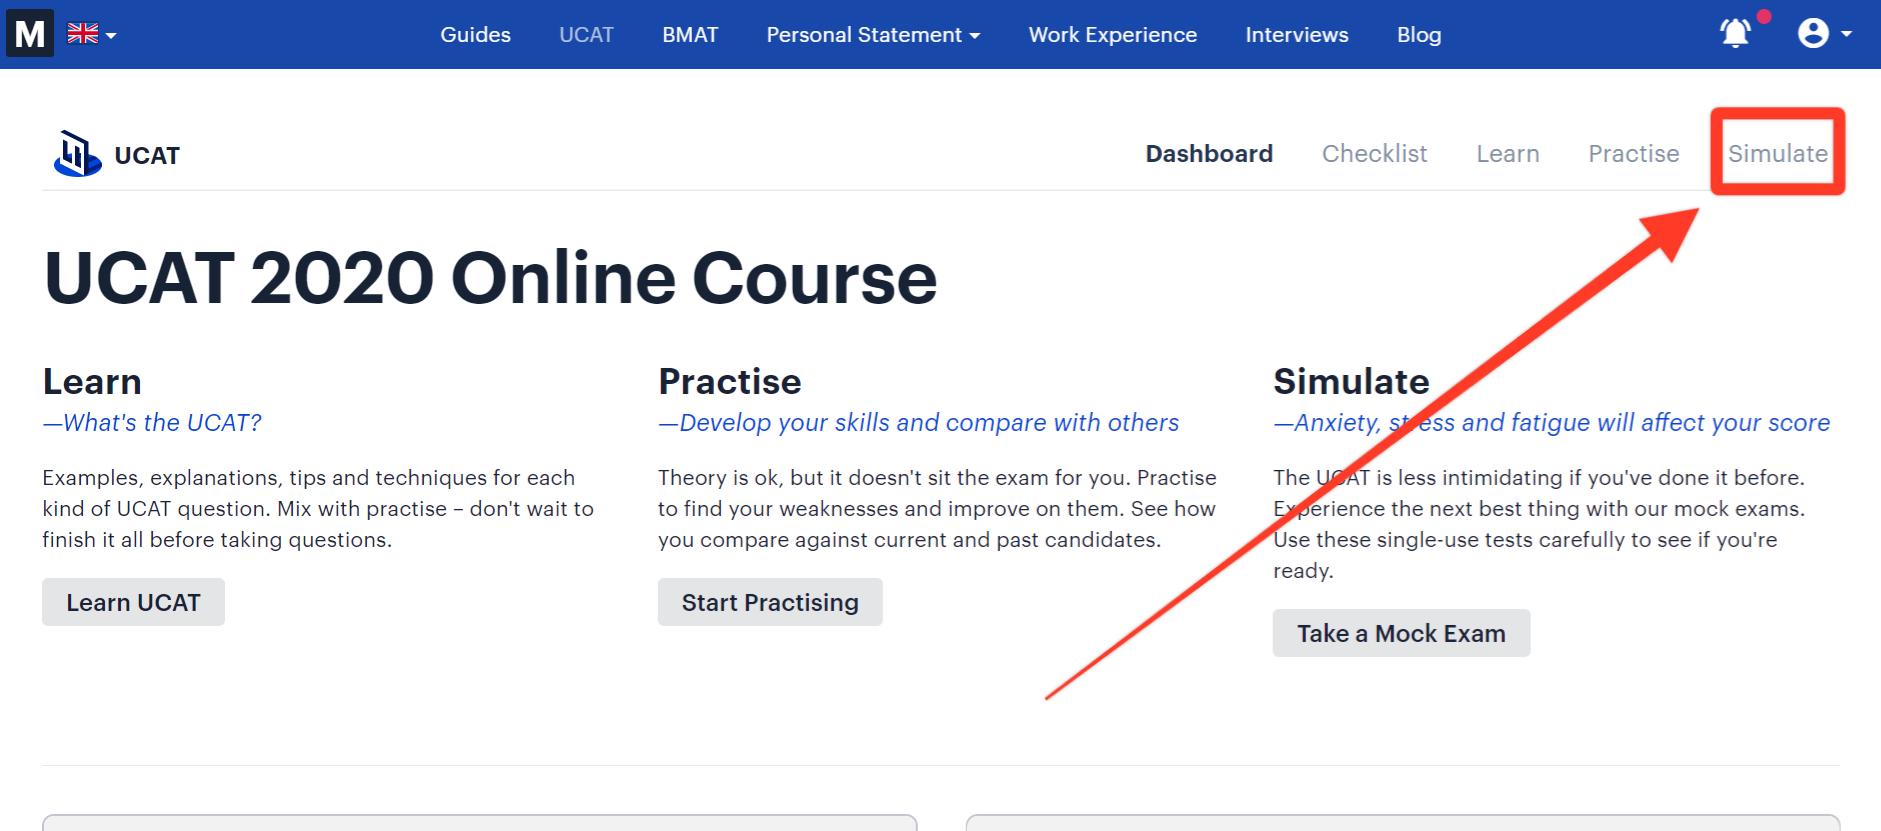 Medify's UCAT simulate method